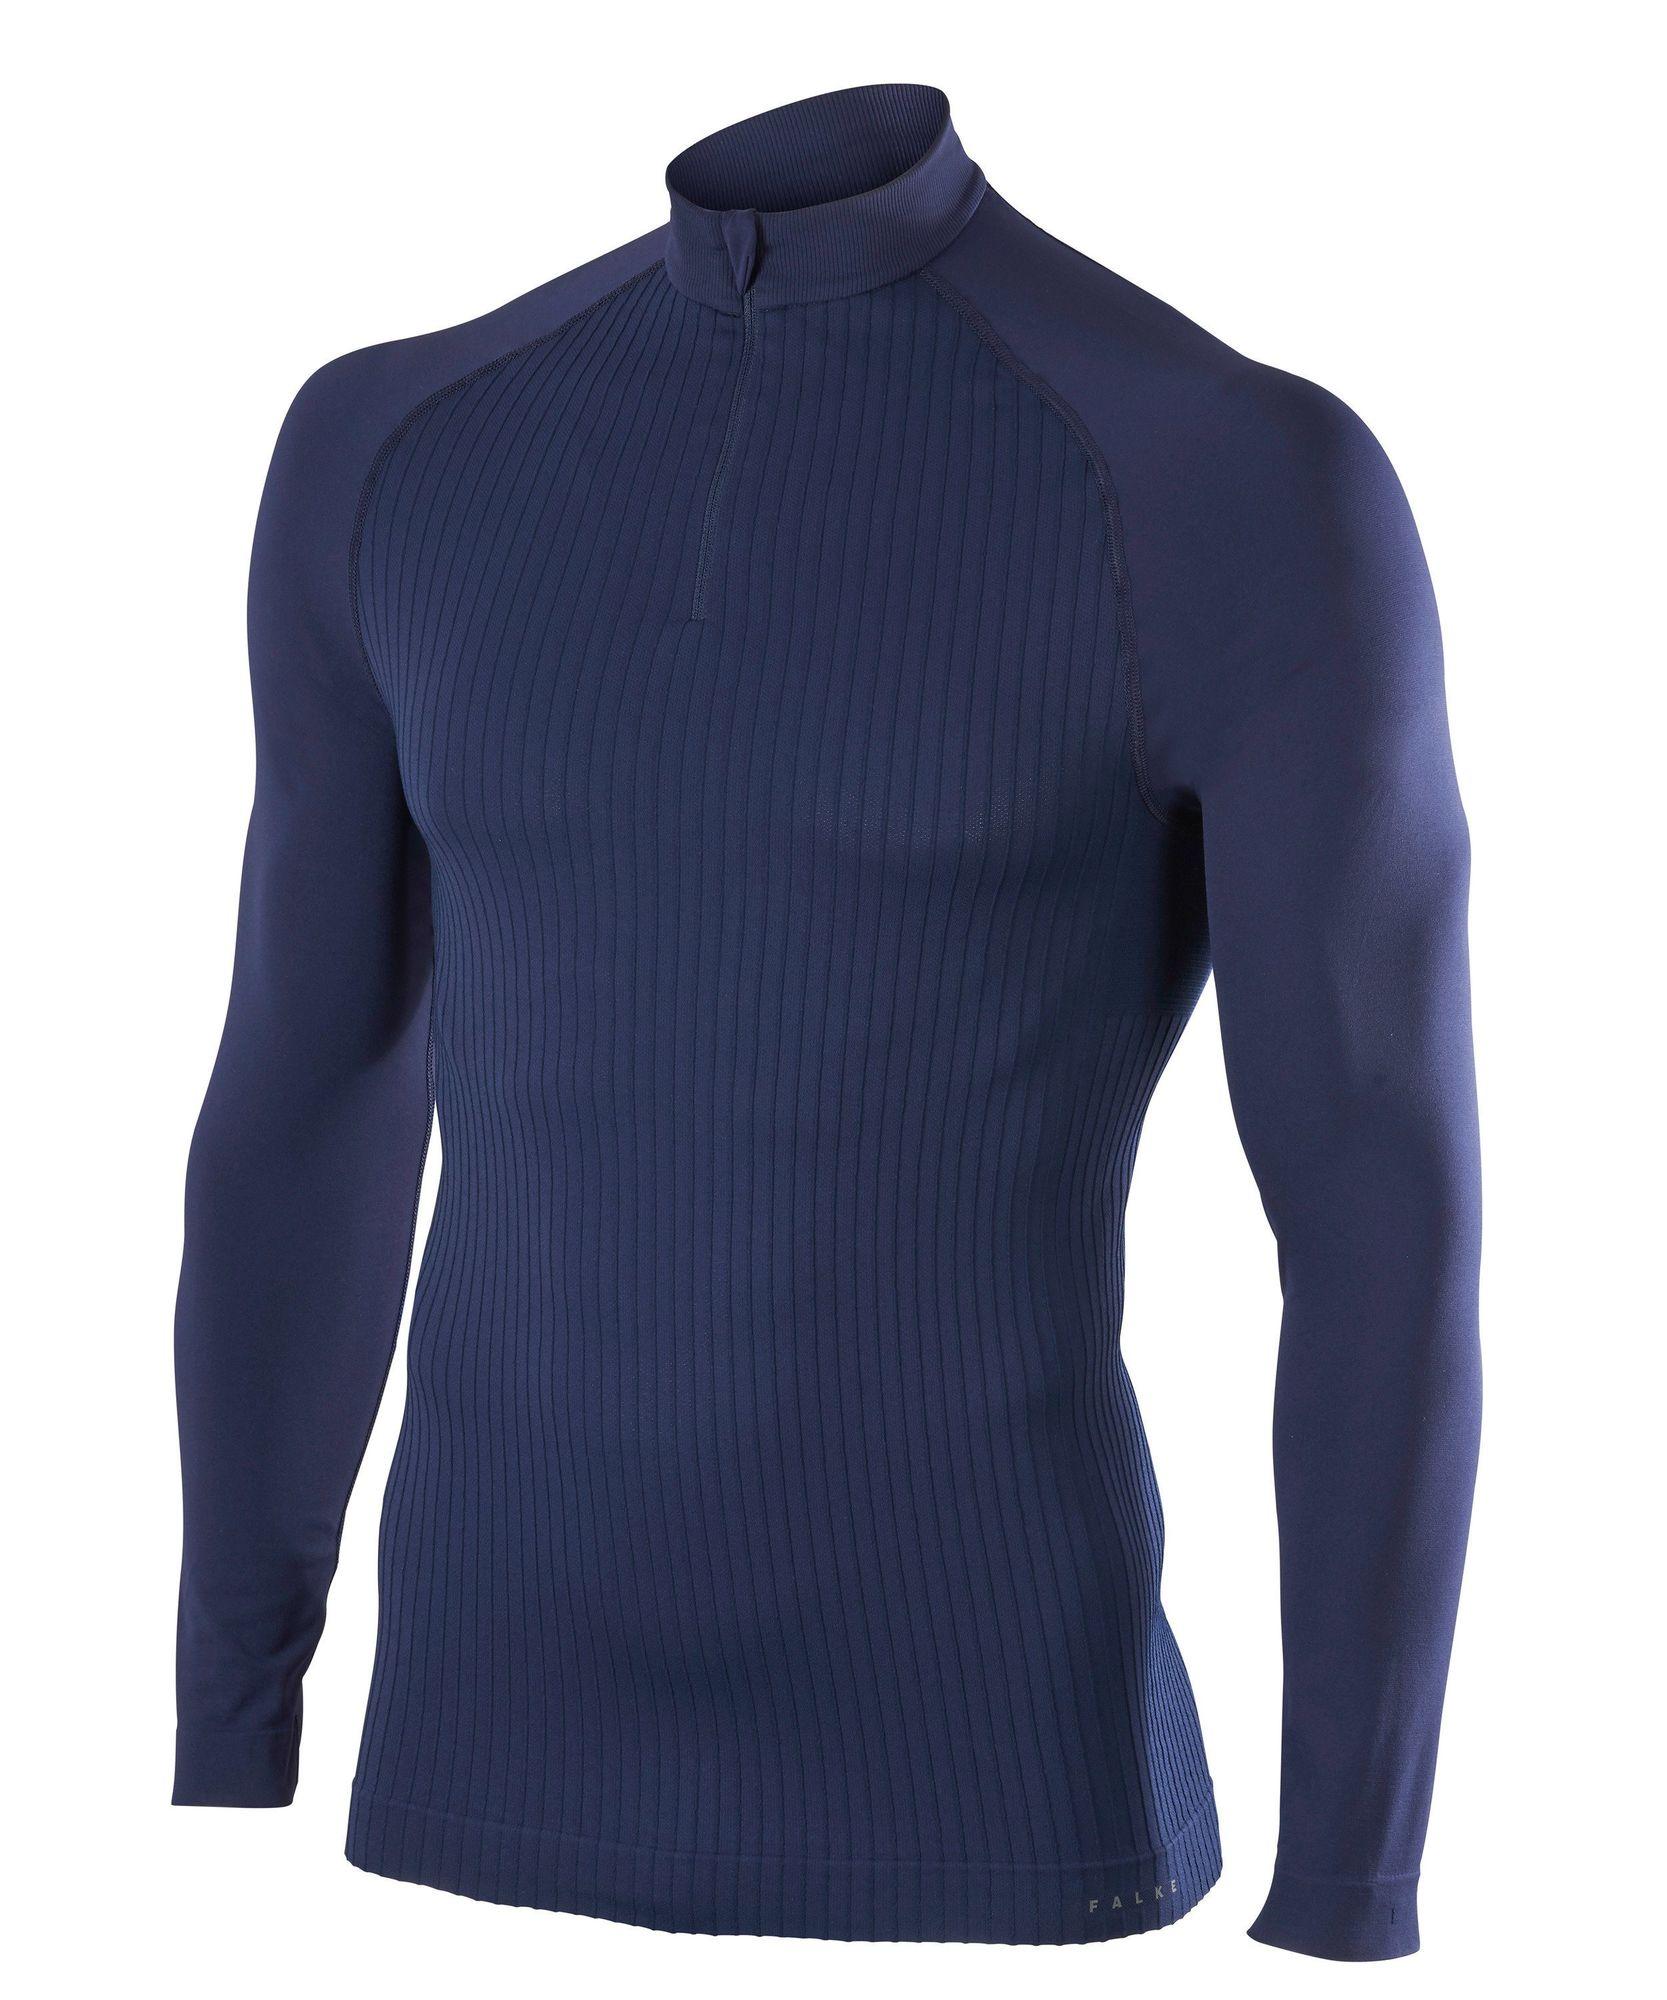 Falke Langarmshirt Warm in Blau